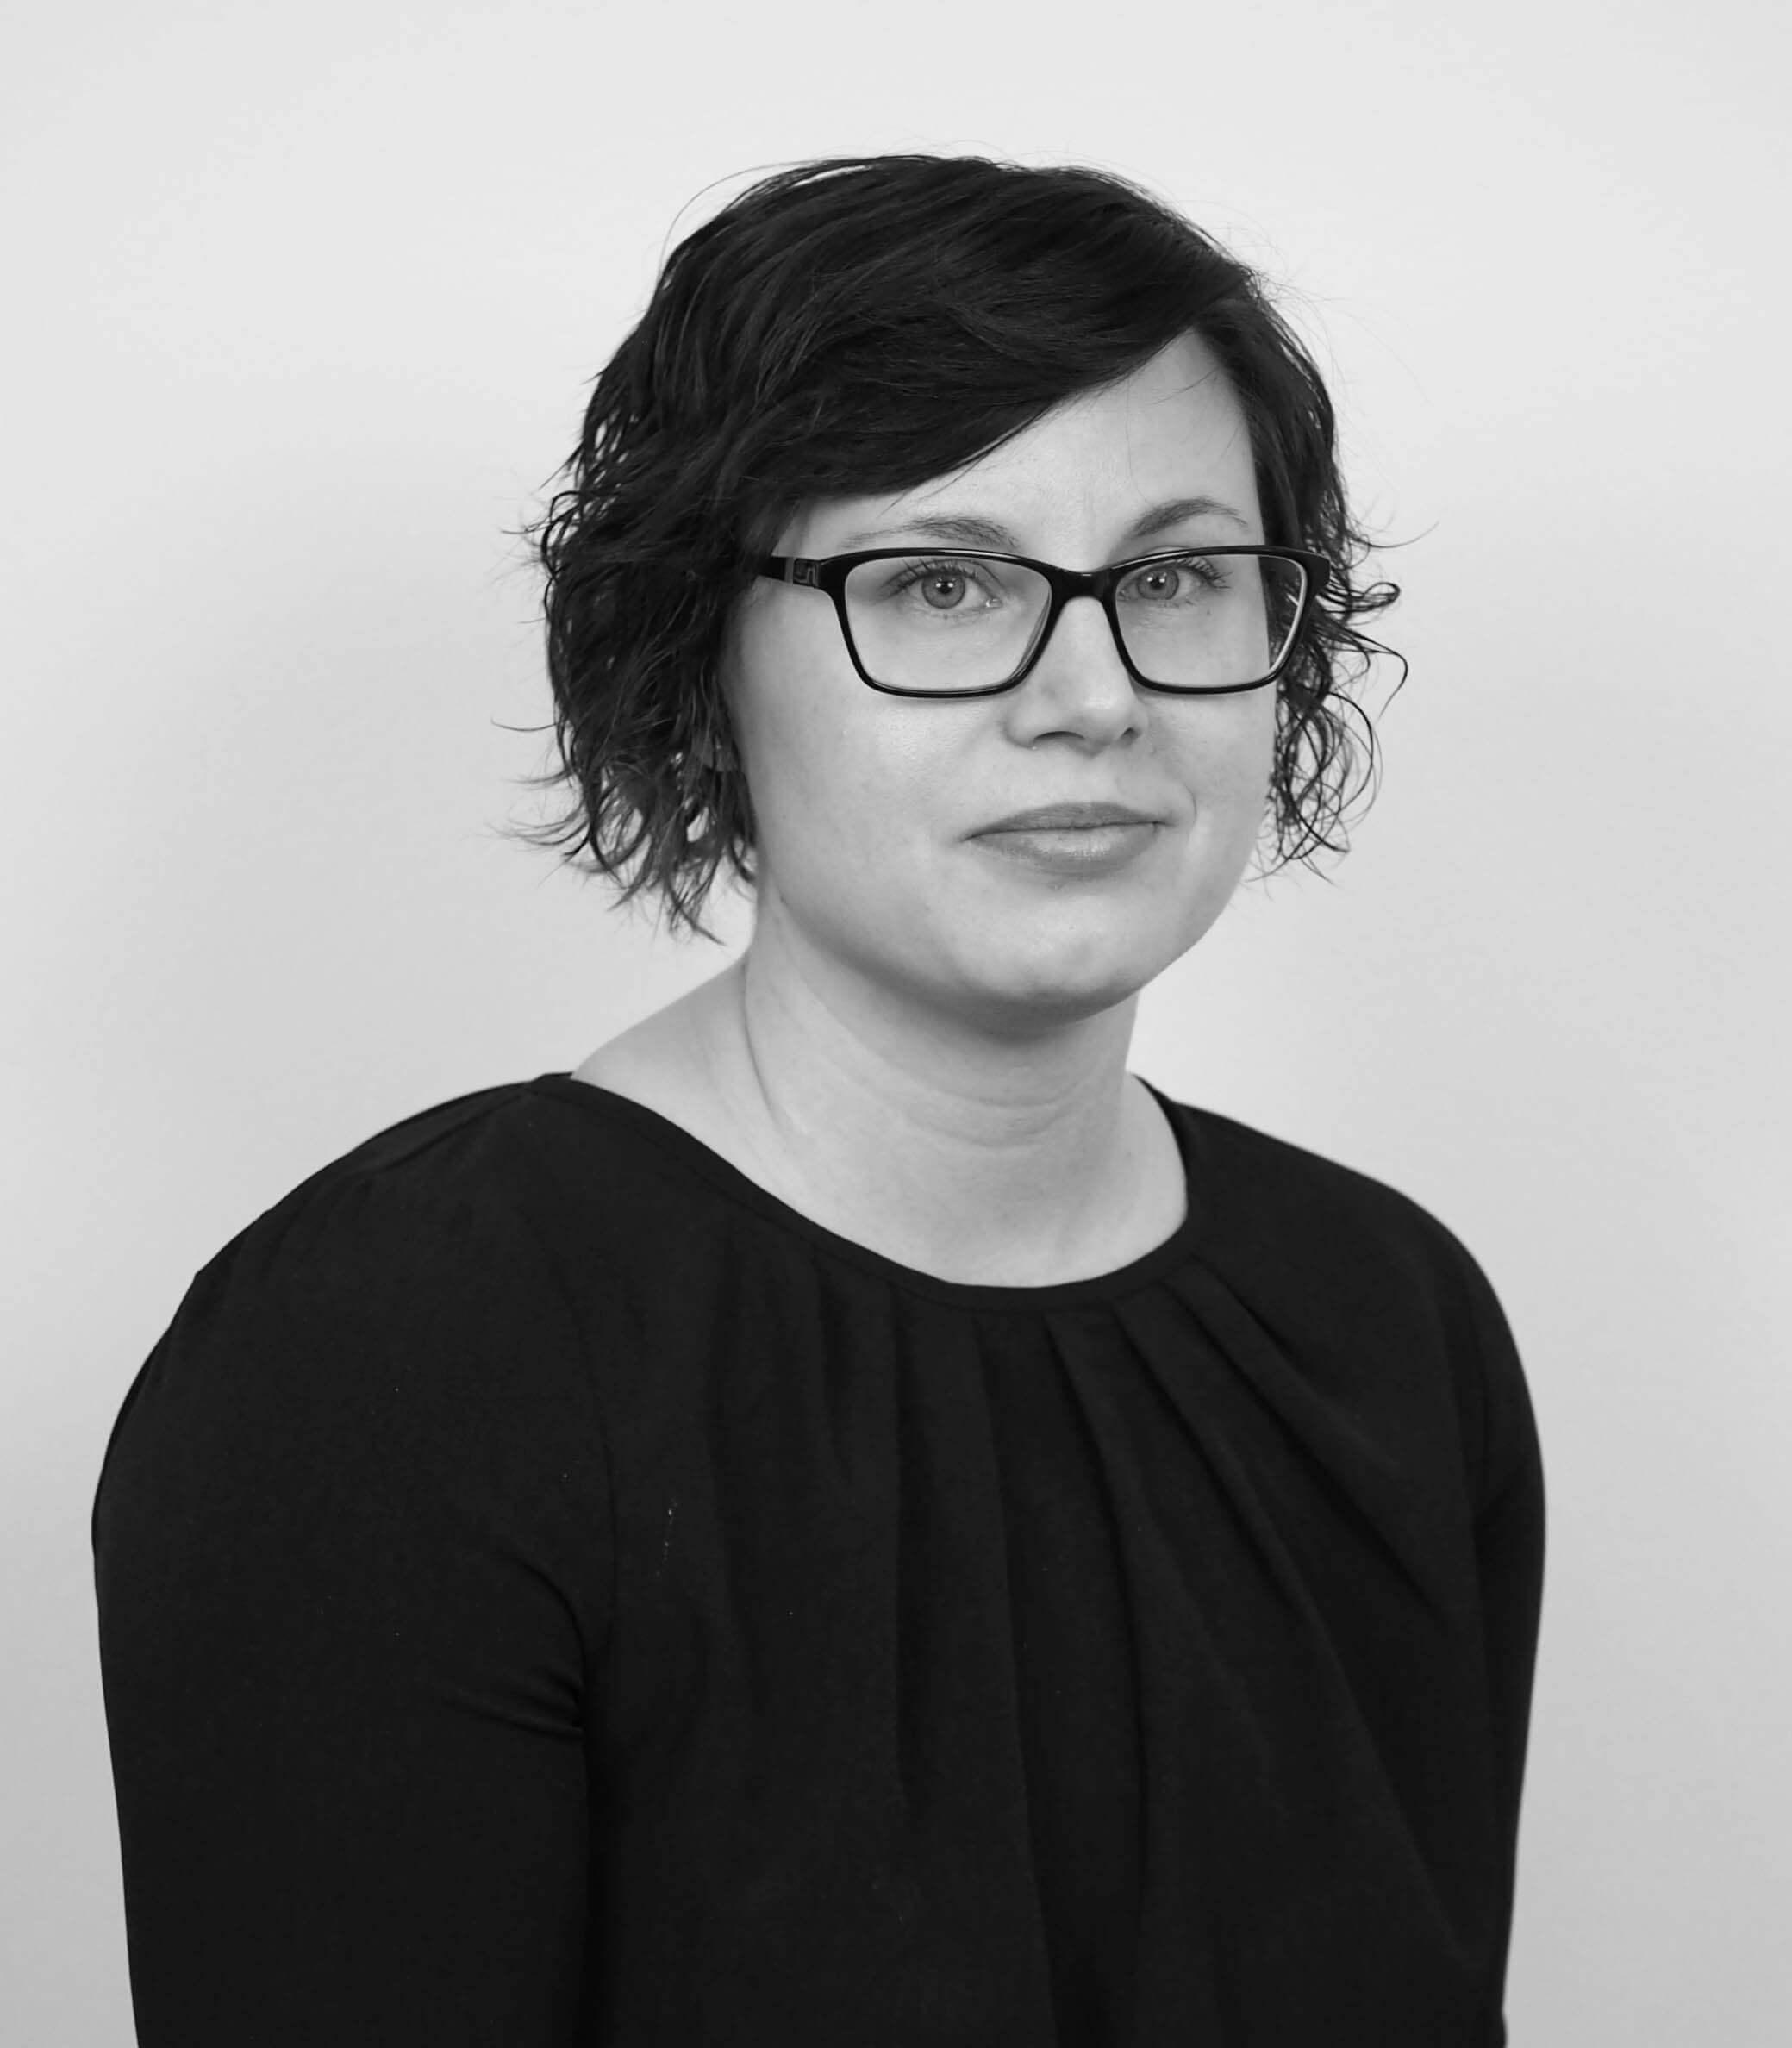 Greenstep (fi) - Maria Pasanen